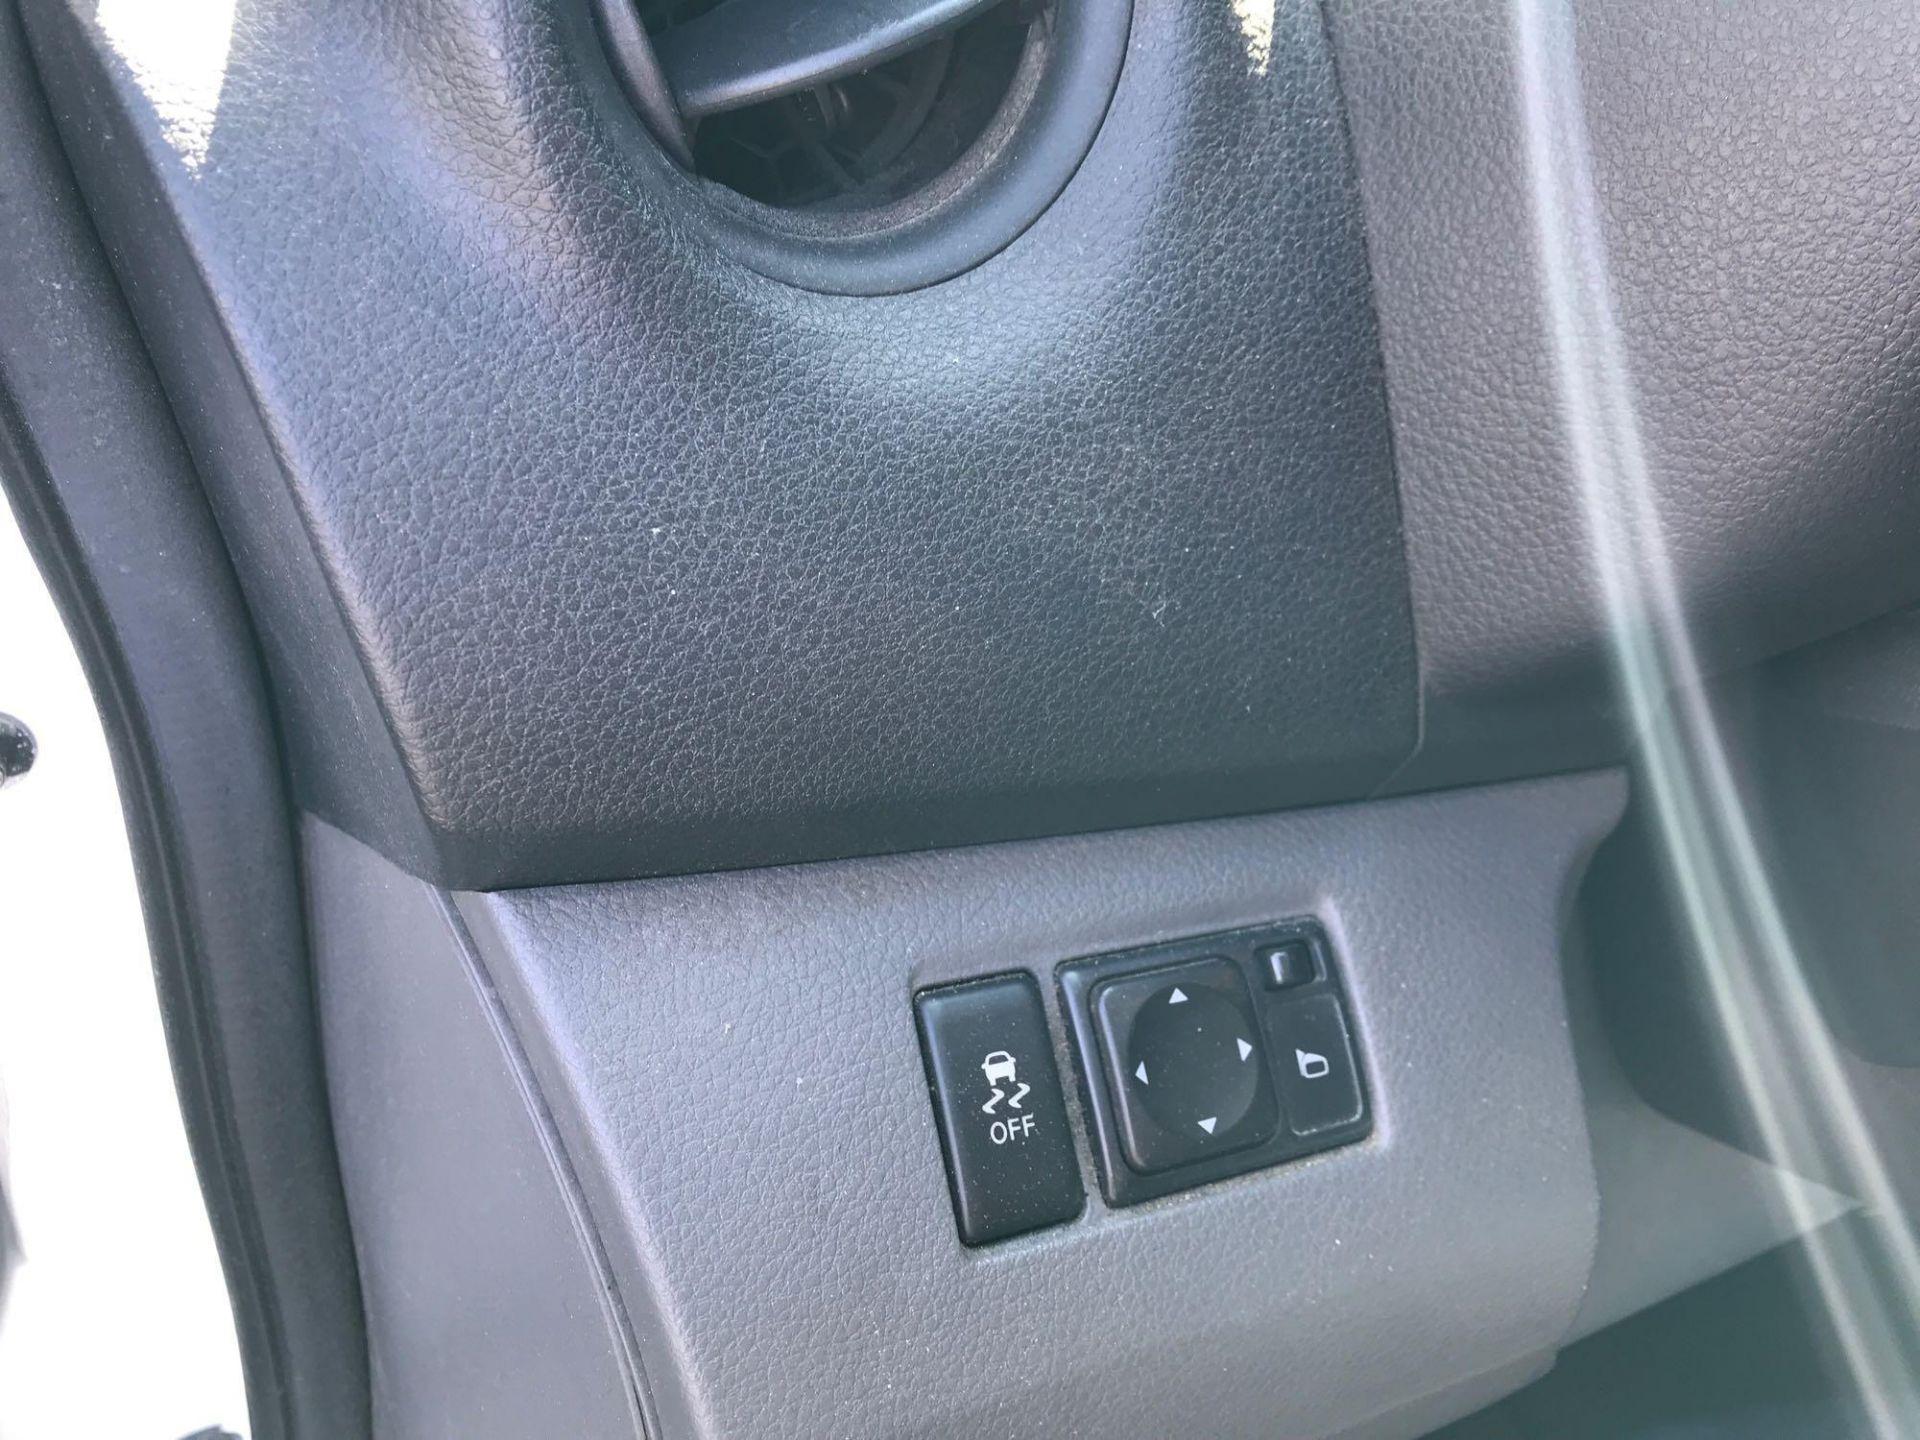 2013 Nissan NV200 Delivery Van - Image 19 of 54